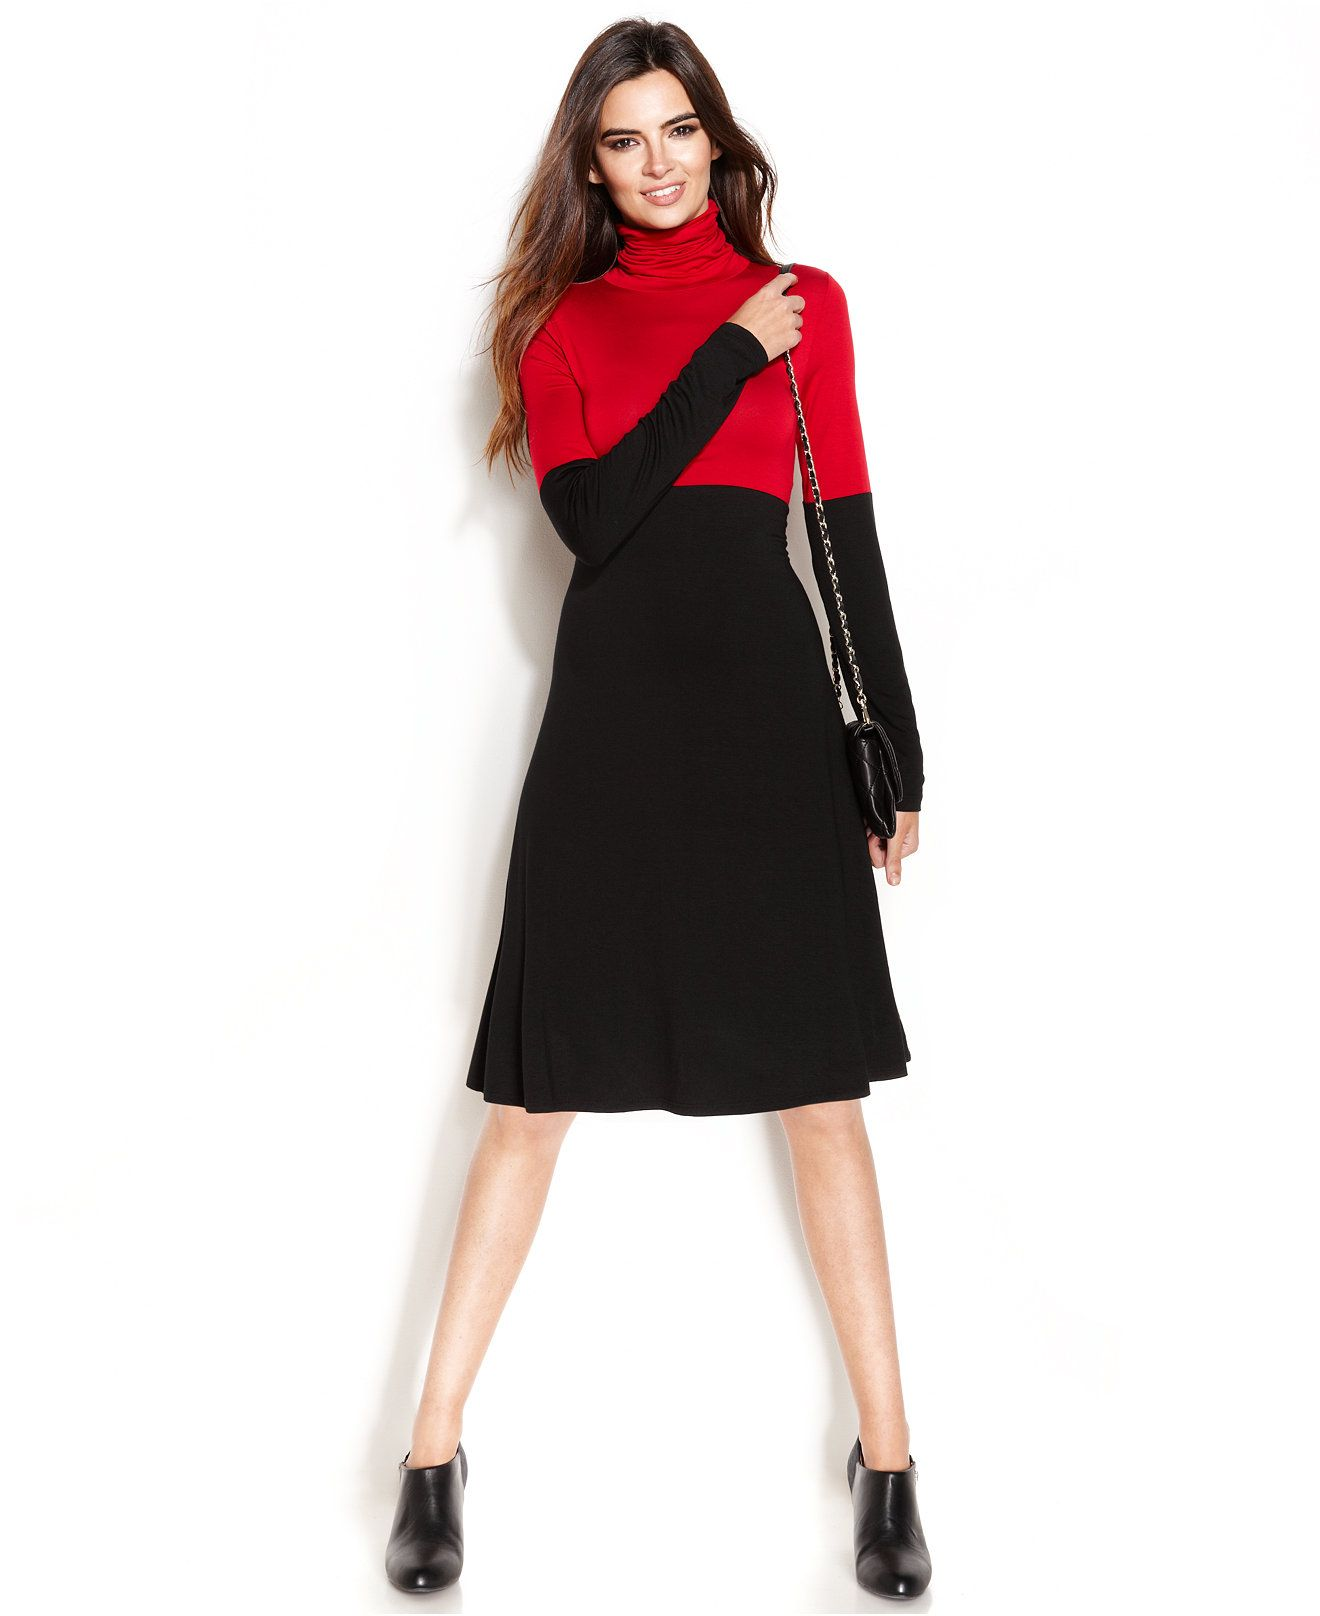 Karen kane turtleneck colorblocked dress dresses women macyus